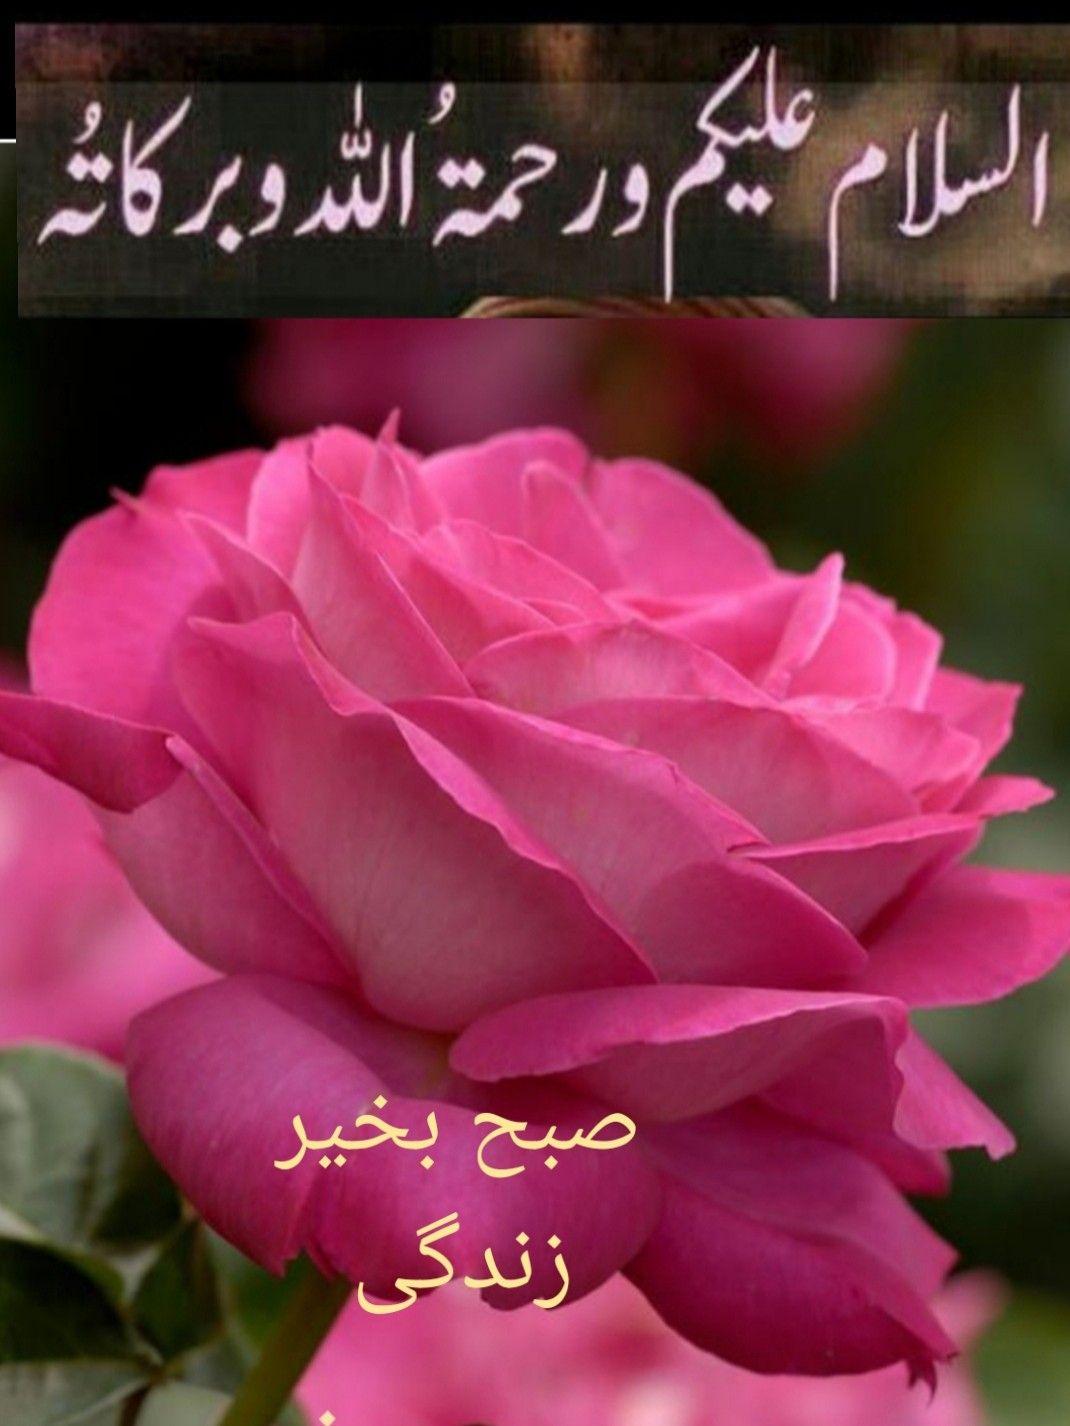 Pin By Safia Habib On السلام عليكم صباح الخير Good Morning Flowers Good Morning Beautiful Quotes Good Morning Messages